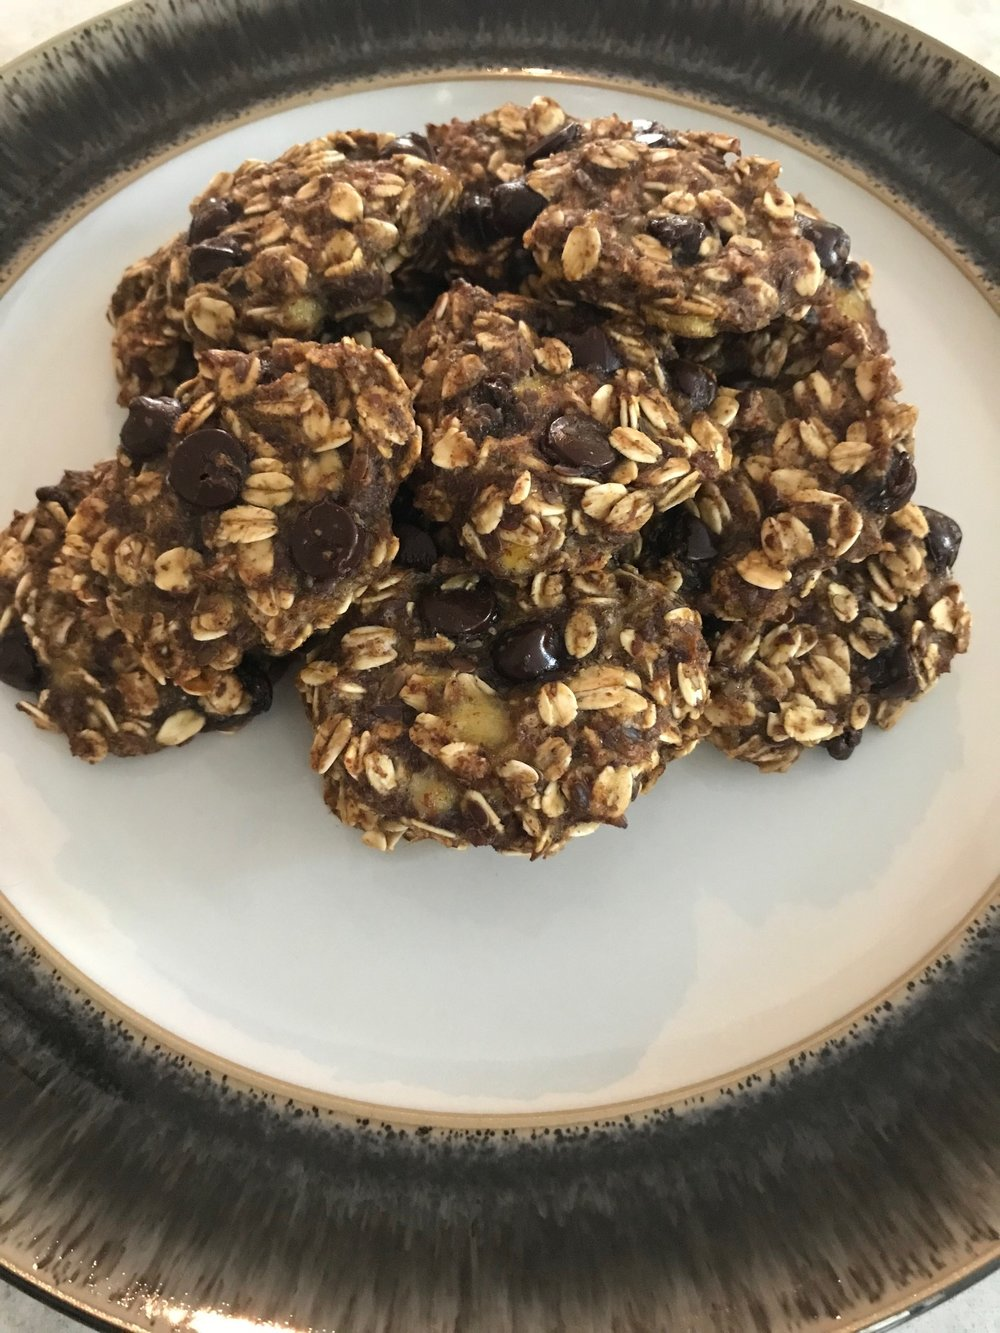 Oatmeal Banana Chocolate Chip Cookies